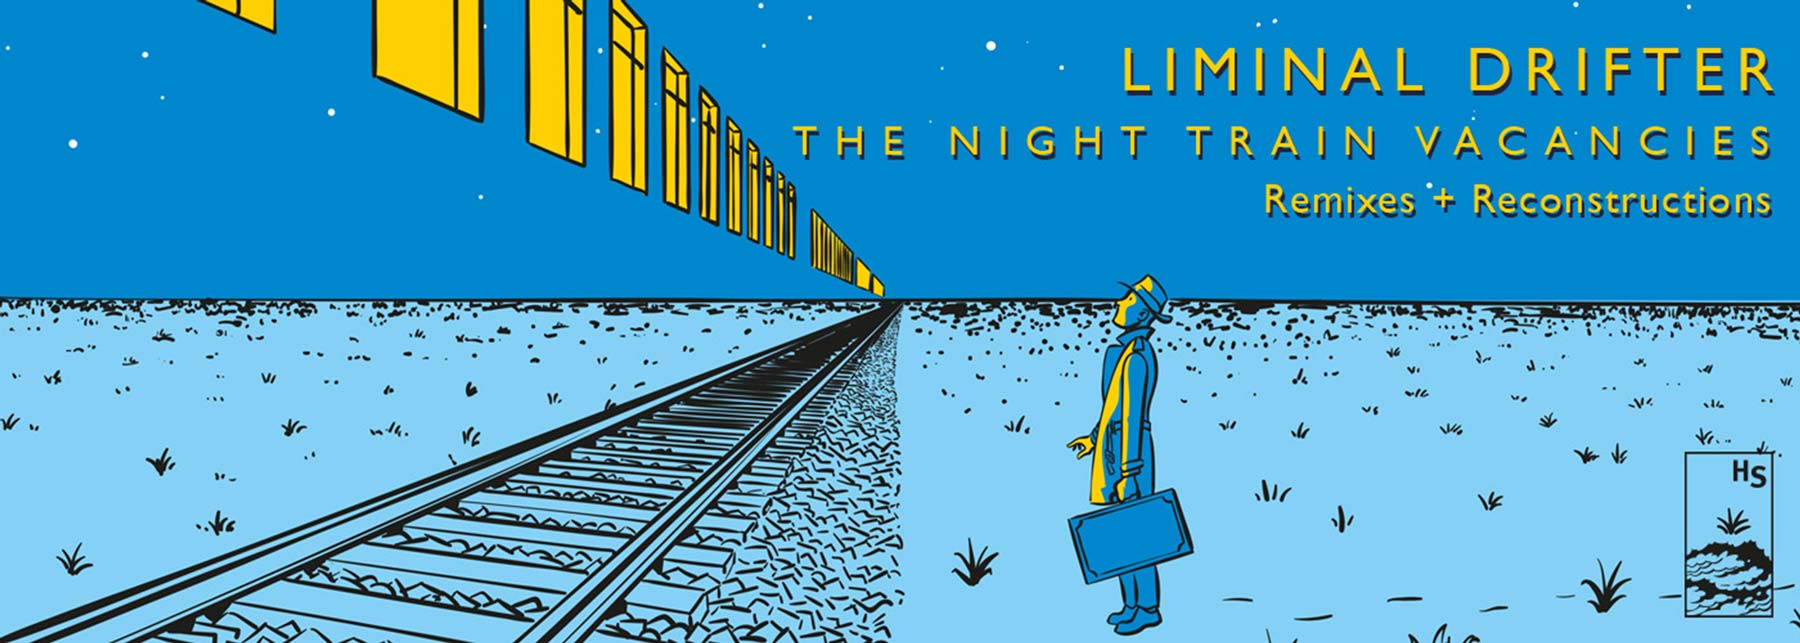 LIMINAL-DRIFTER-NTV-banner-Train-BC-web